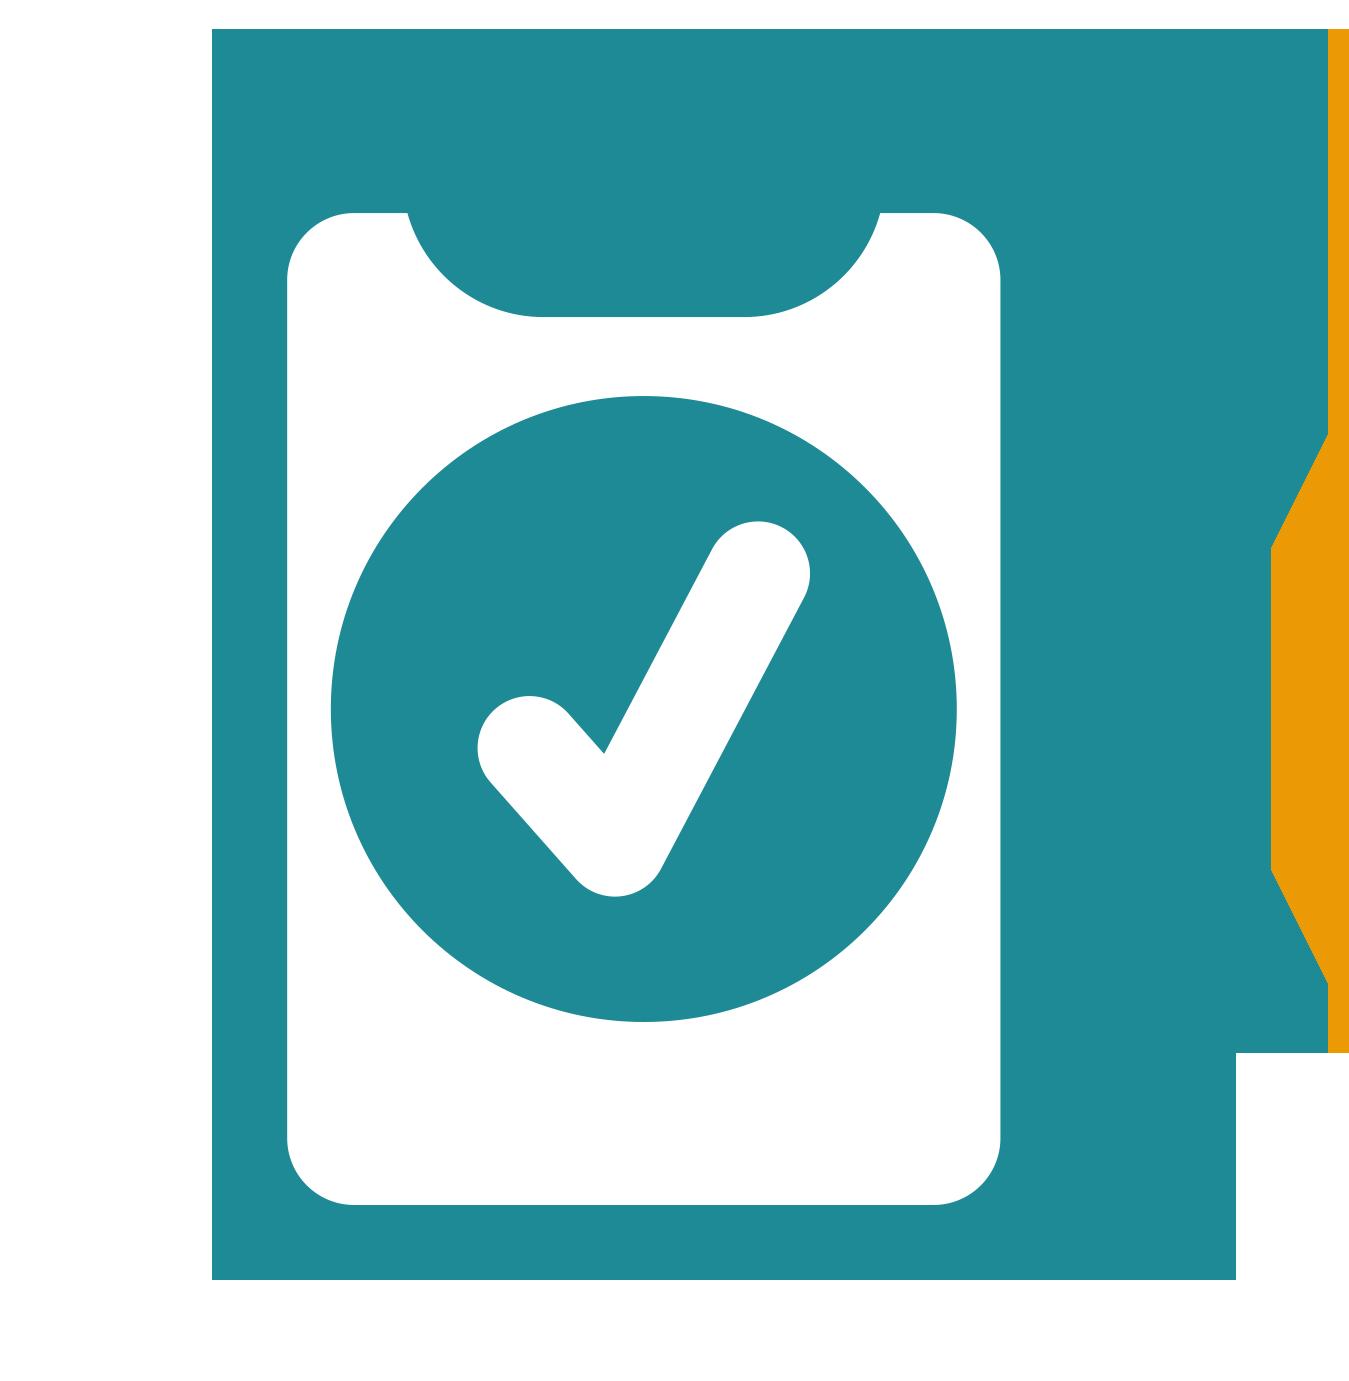 Checklists & Rubrics for Evaluating Online Programs